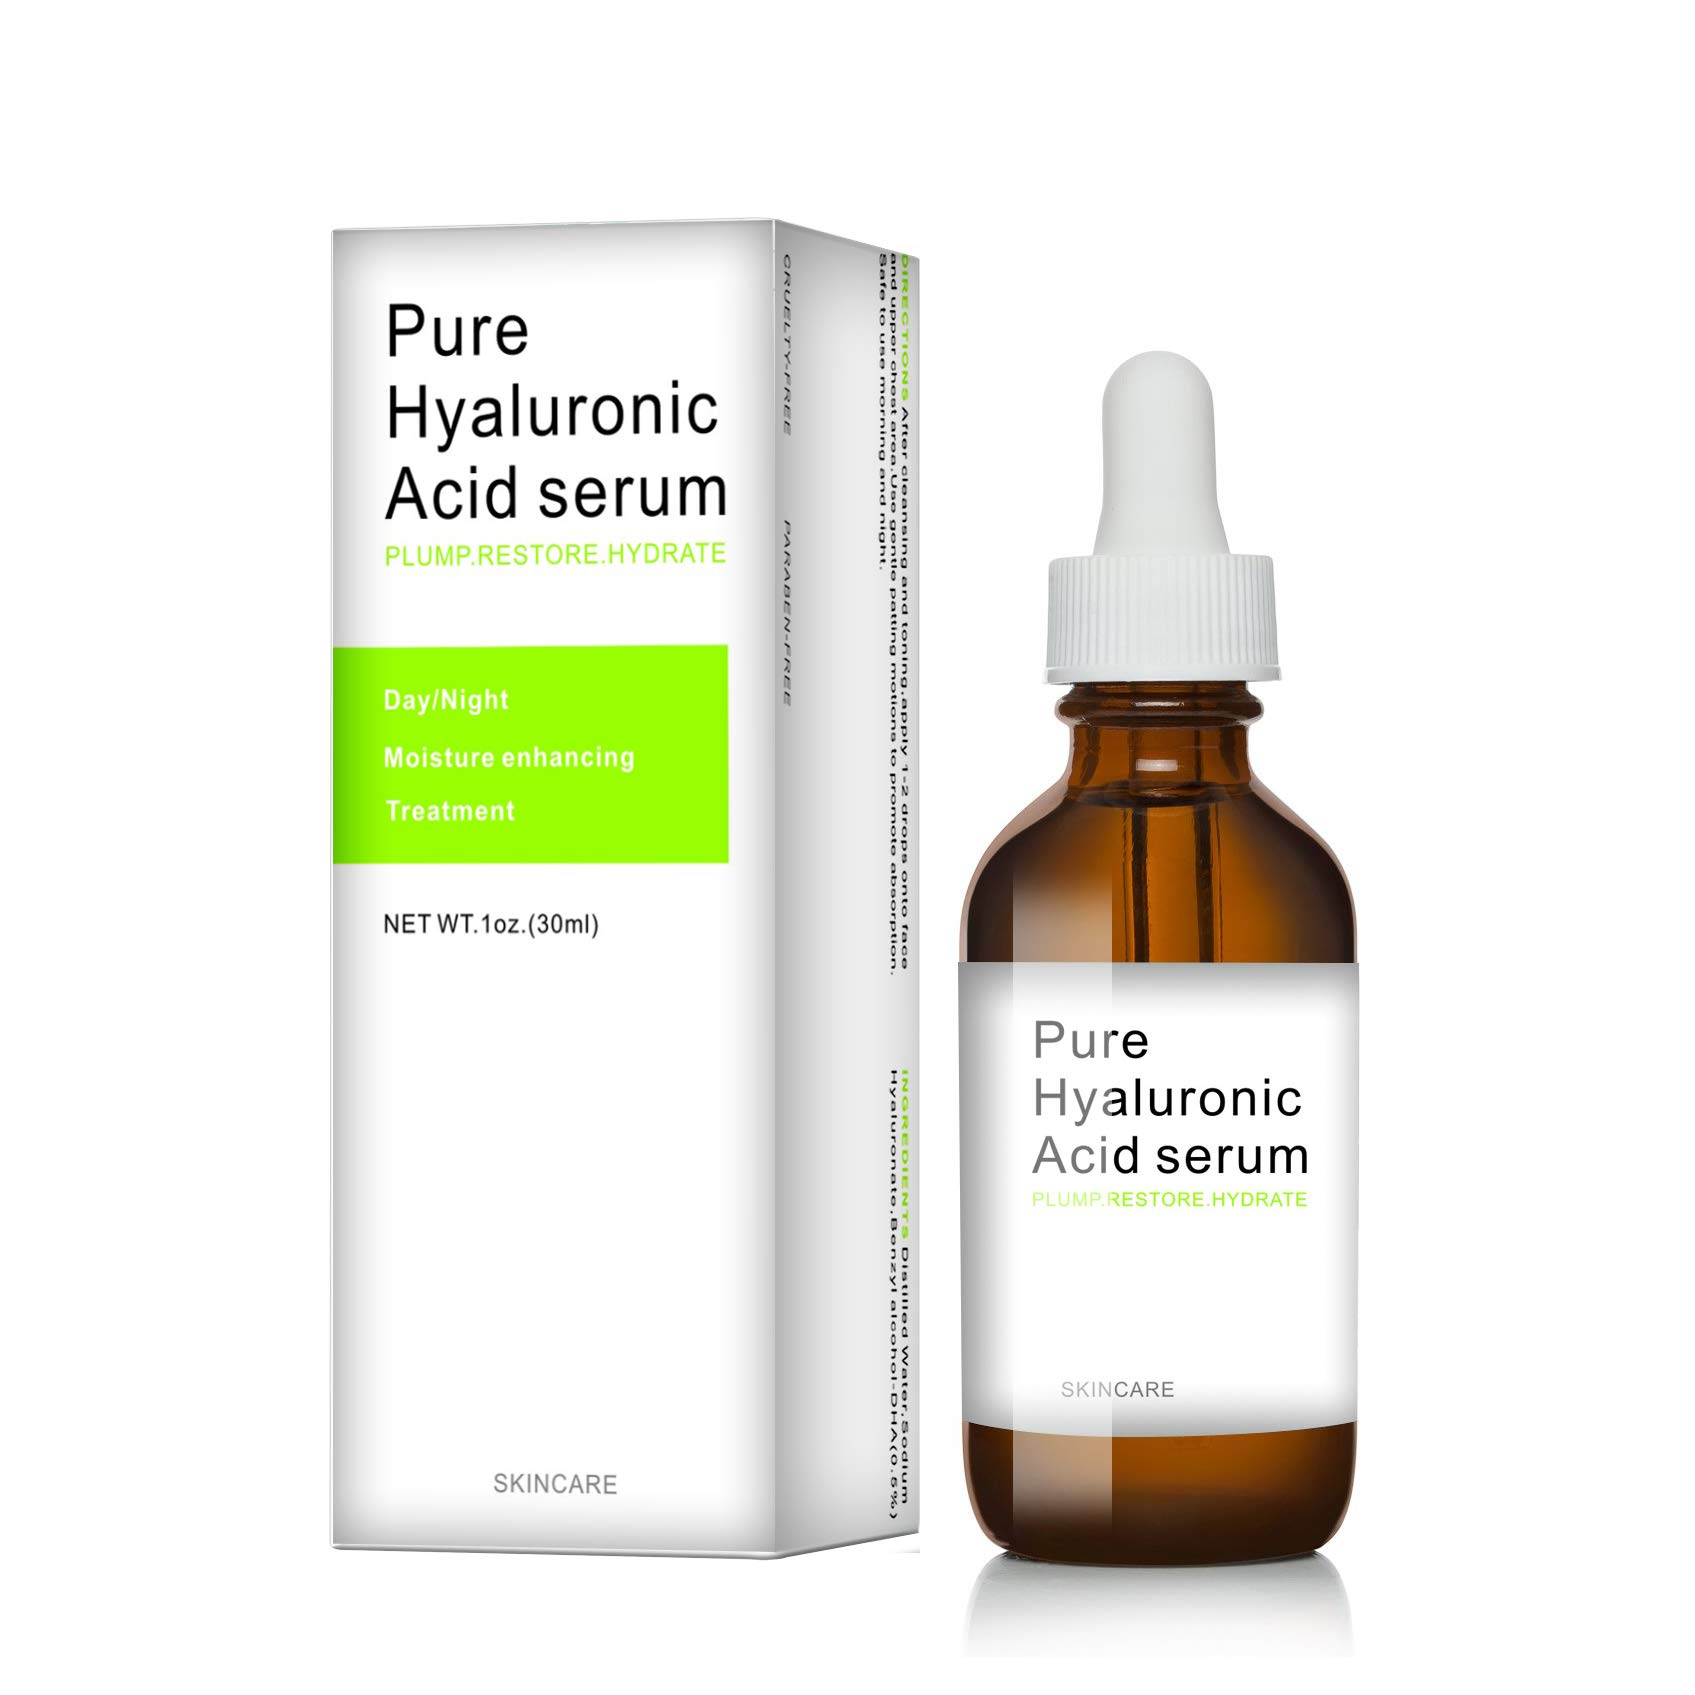 Dermapeel pure hyaluronic acid serum skin care facial care hyaluronic acid moisturizer-100% Pure,Anti-Aging Serum-Intense Hydration+Moisturizer,Non-greasy,Paraben Free-S07